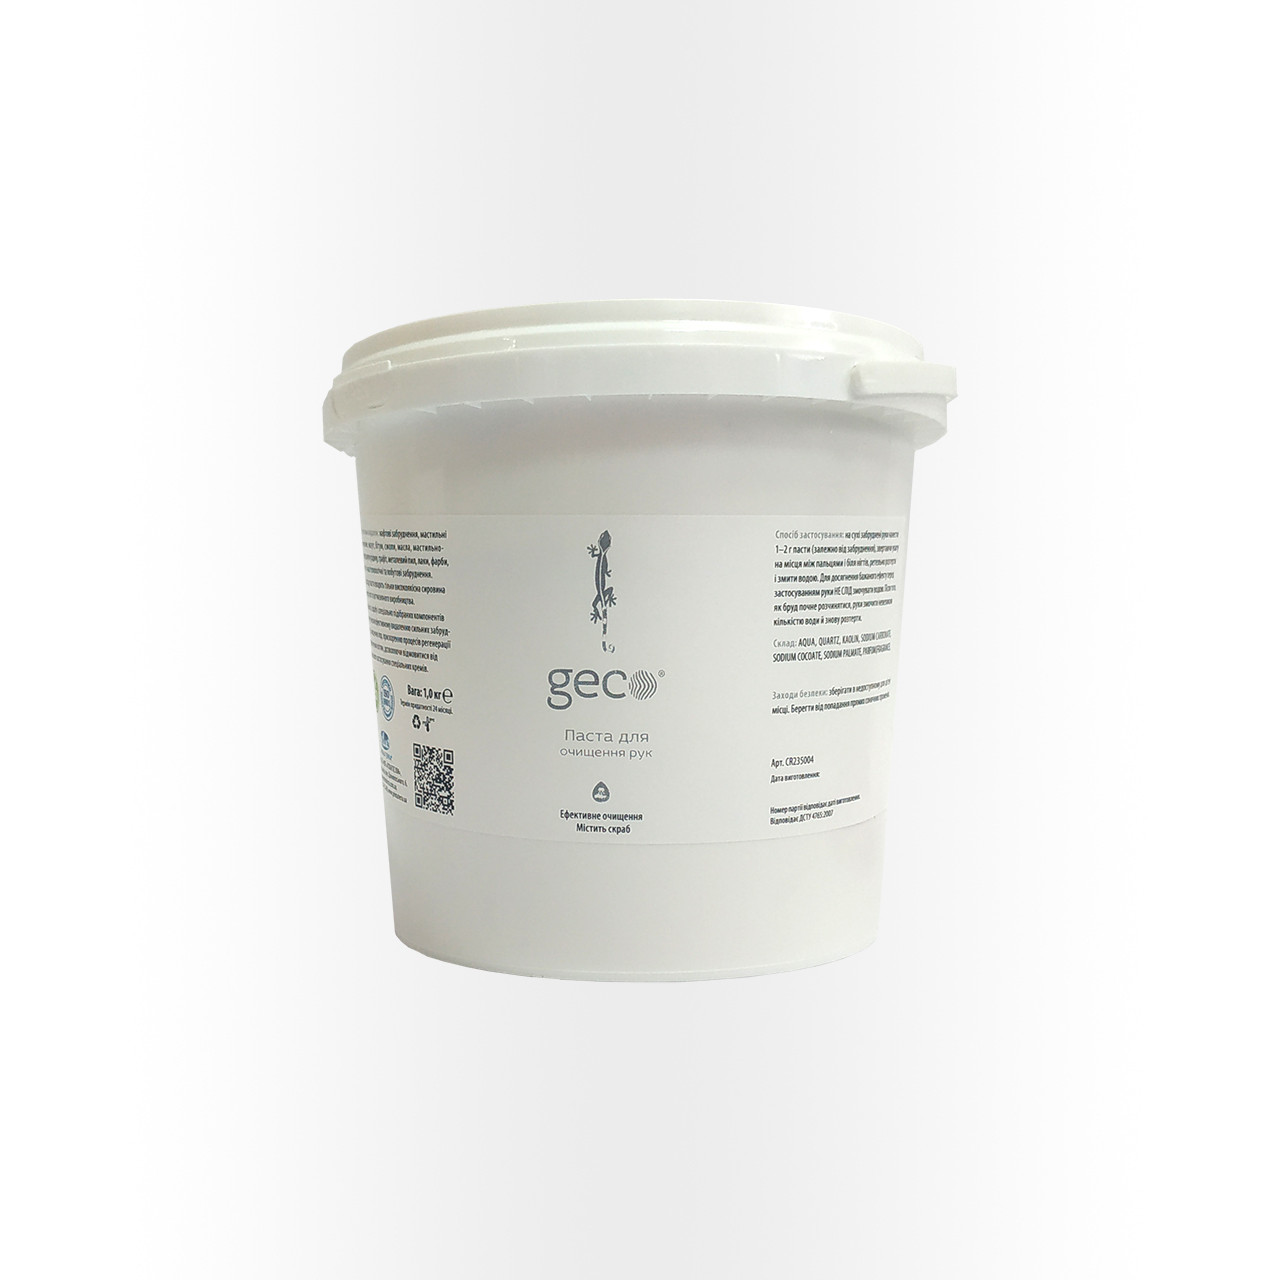 Паста для рук GECO (1 кг)